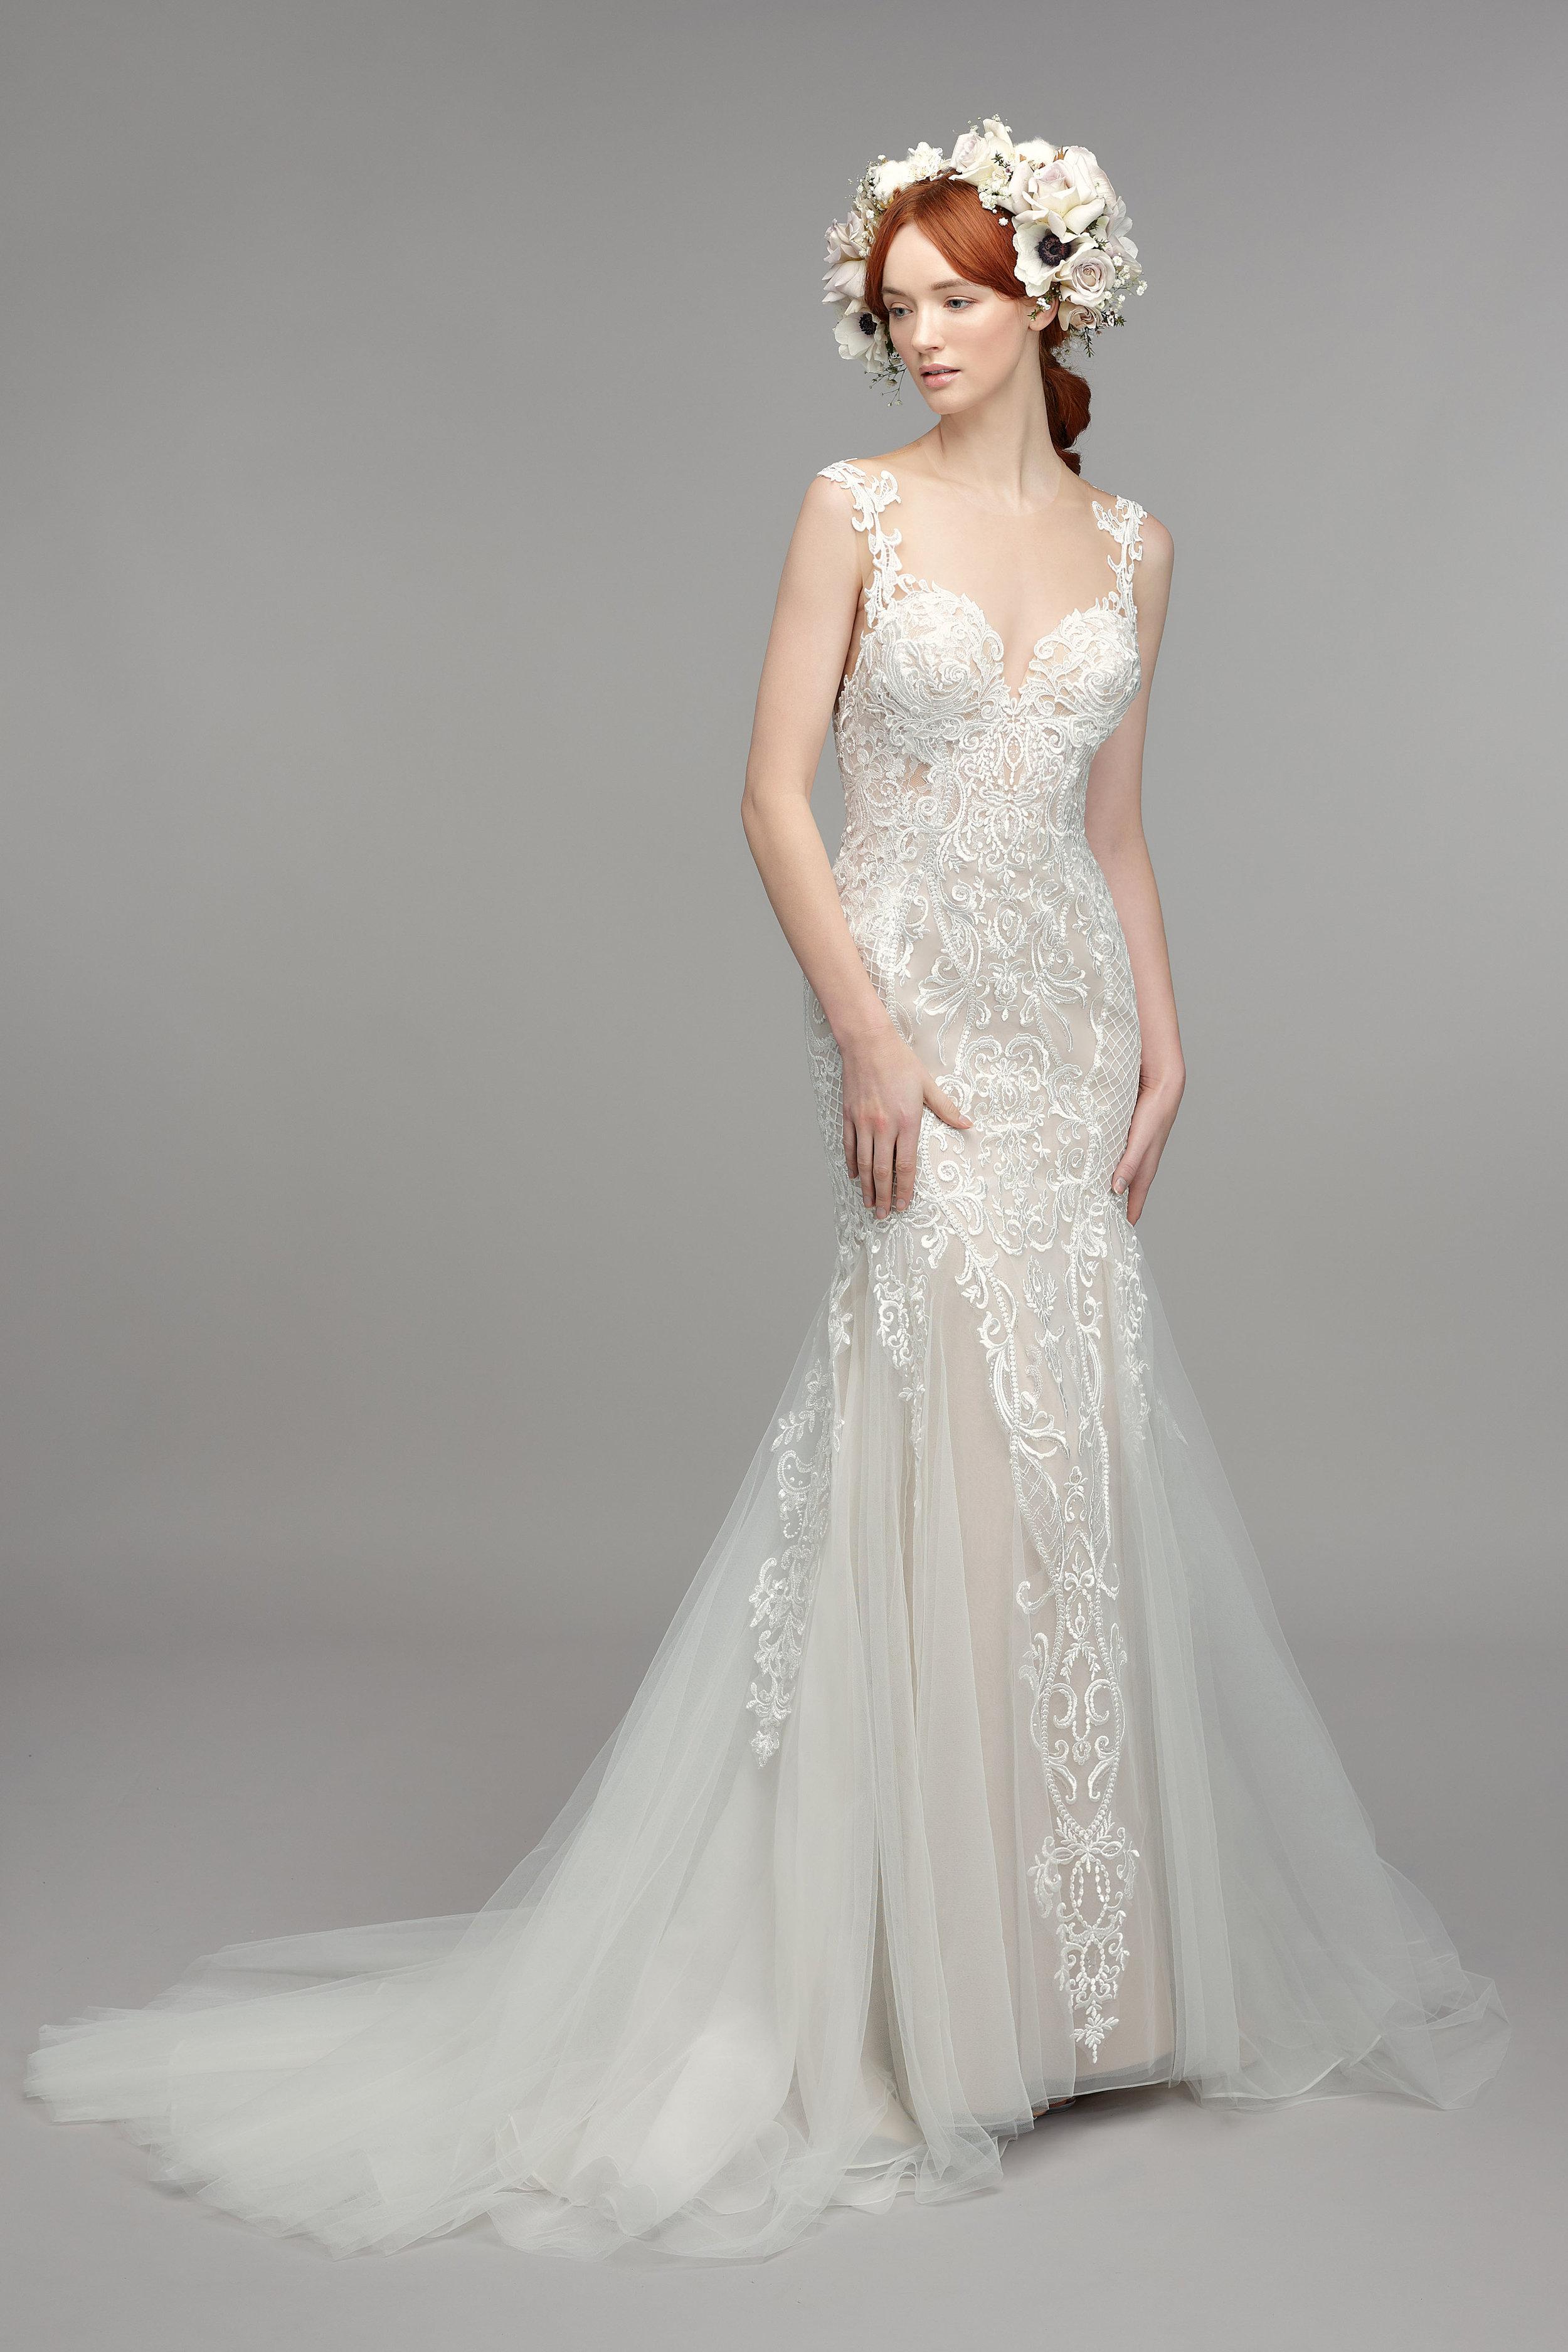 001390_4_alma_j_bridal_aw__160618_final (1).jpg